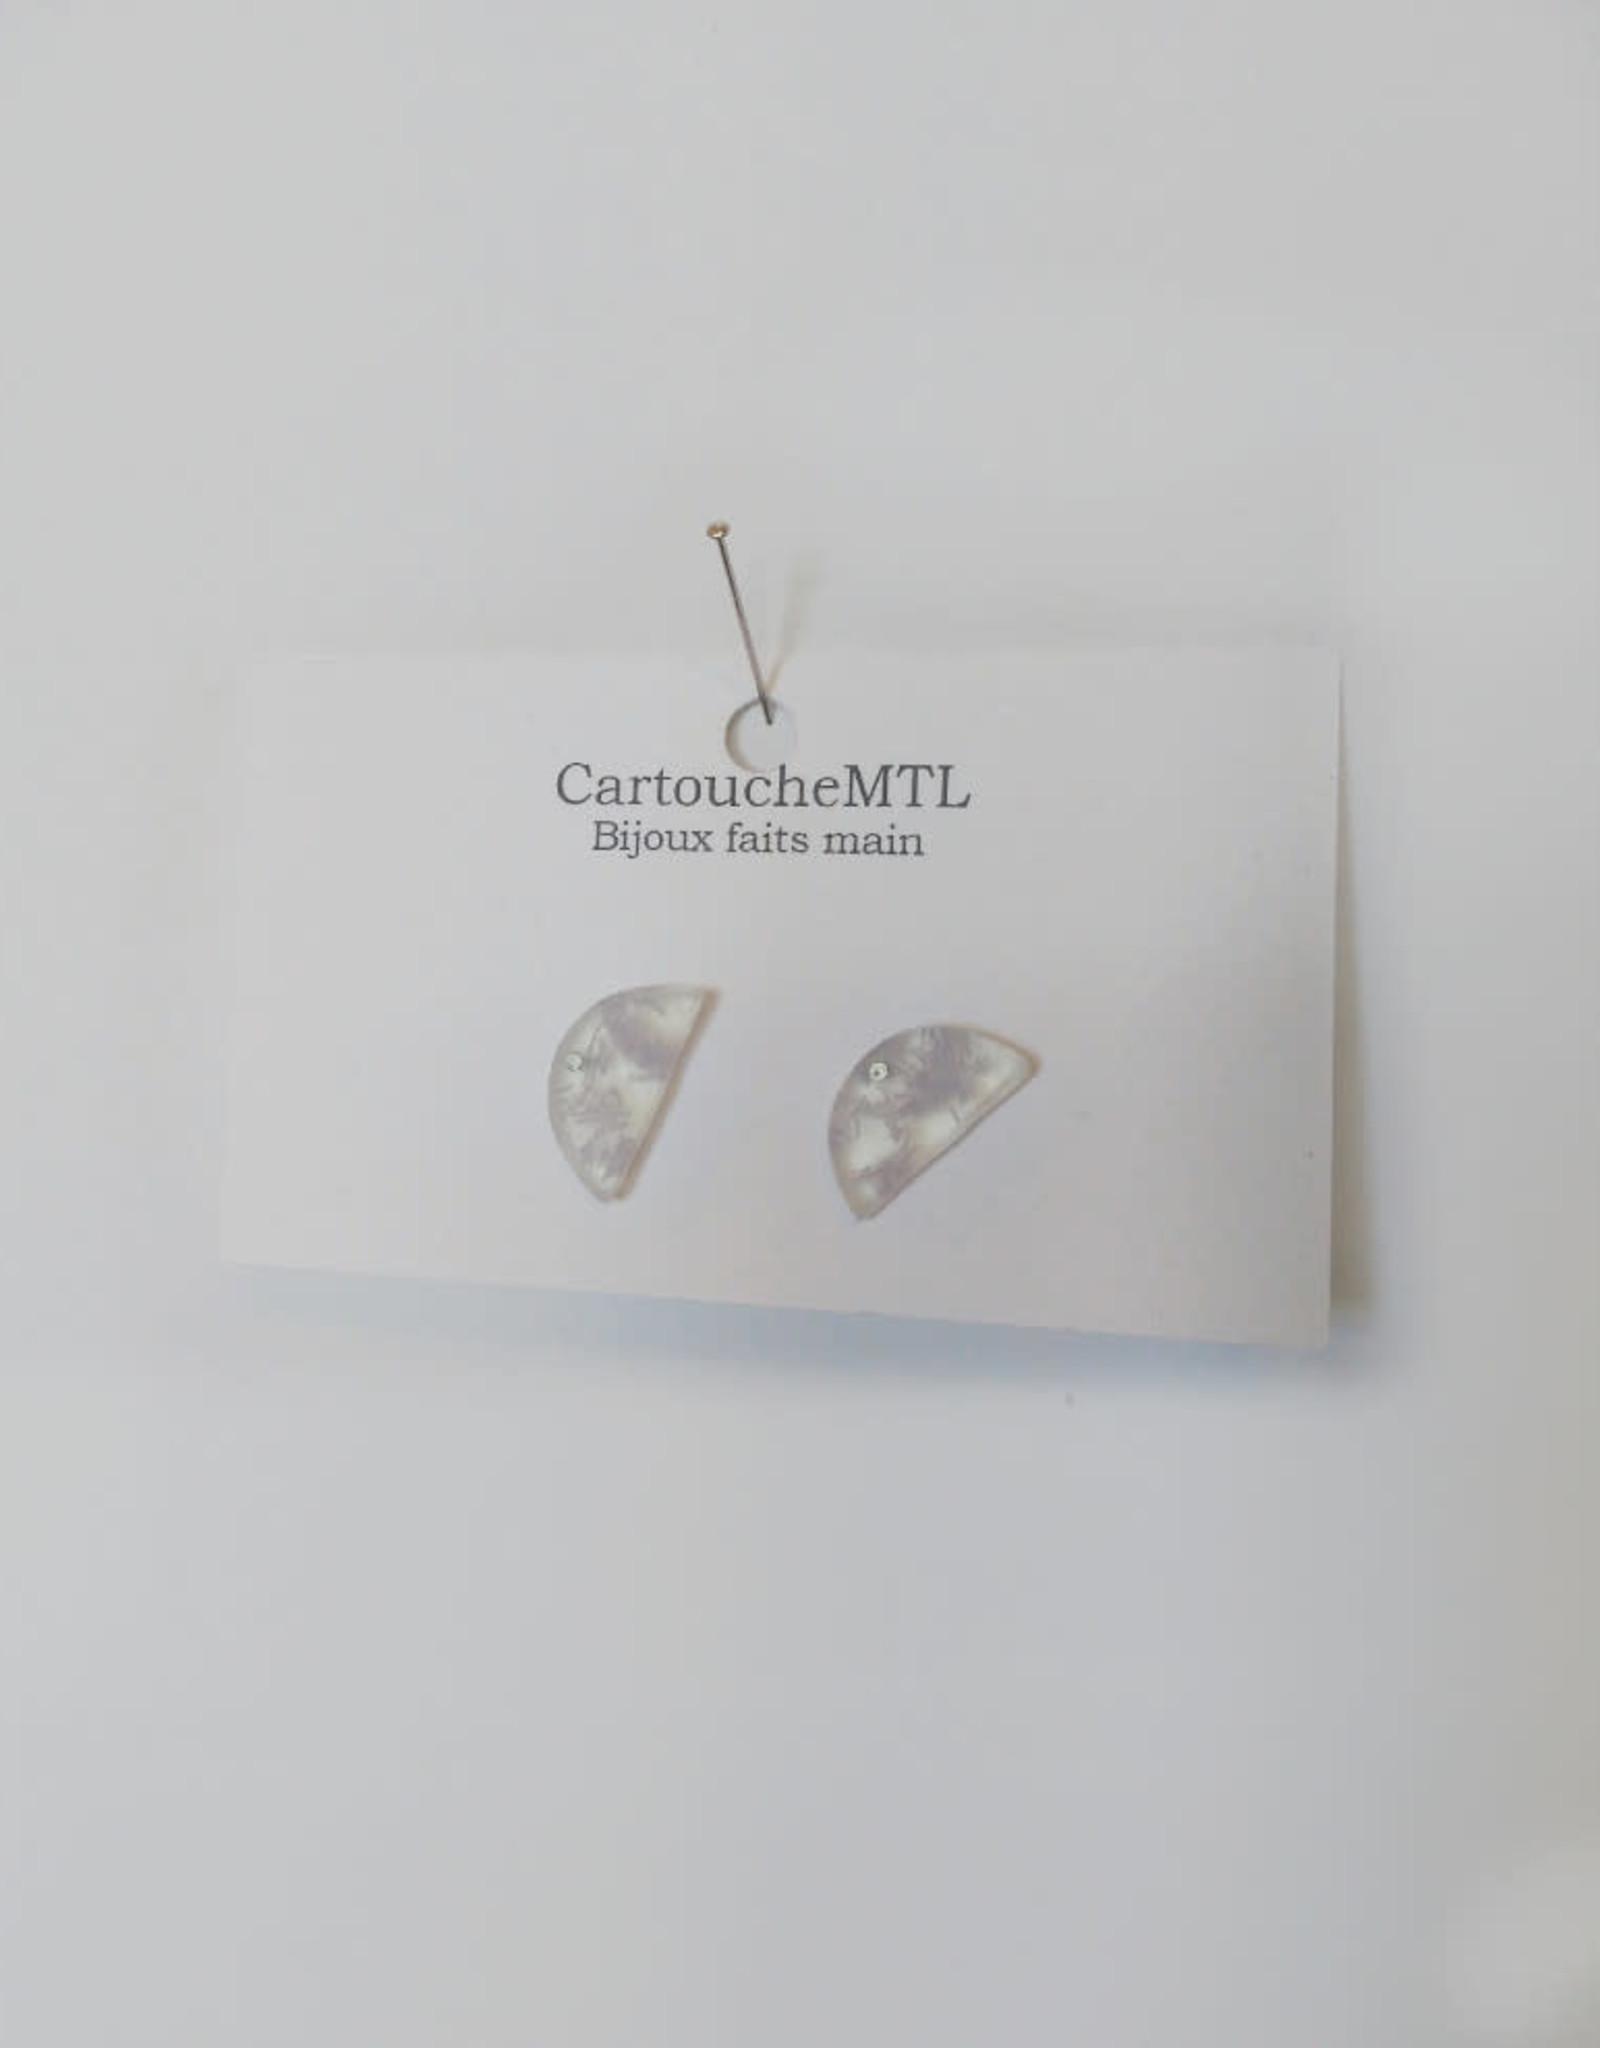 CartoucheMTL Boucles d'oreilles Camille CartoucheMTL Lilas